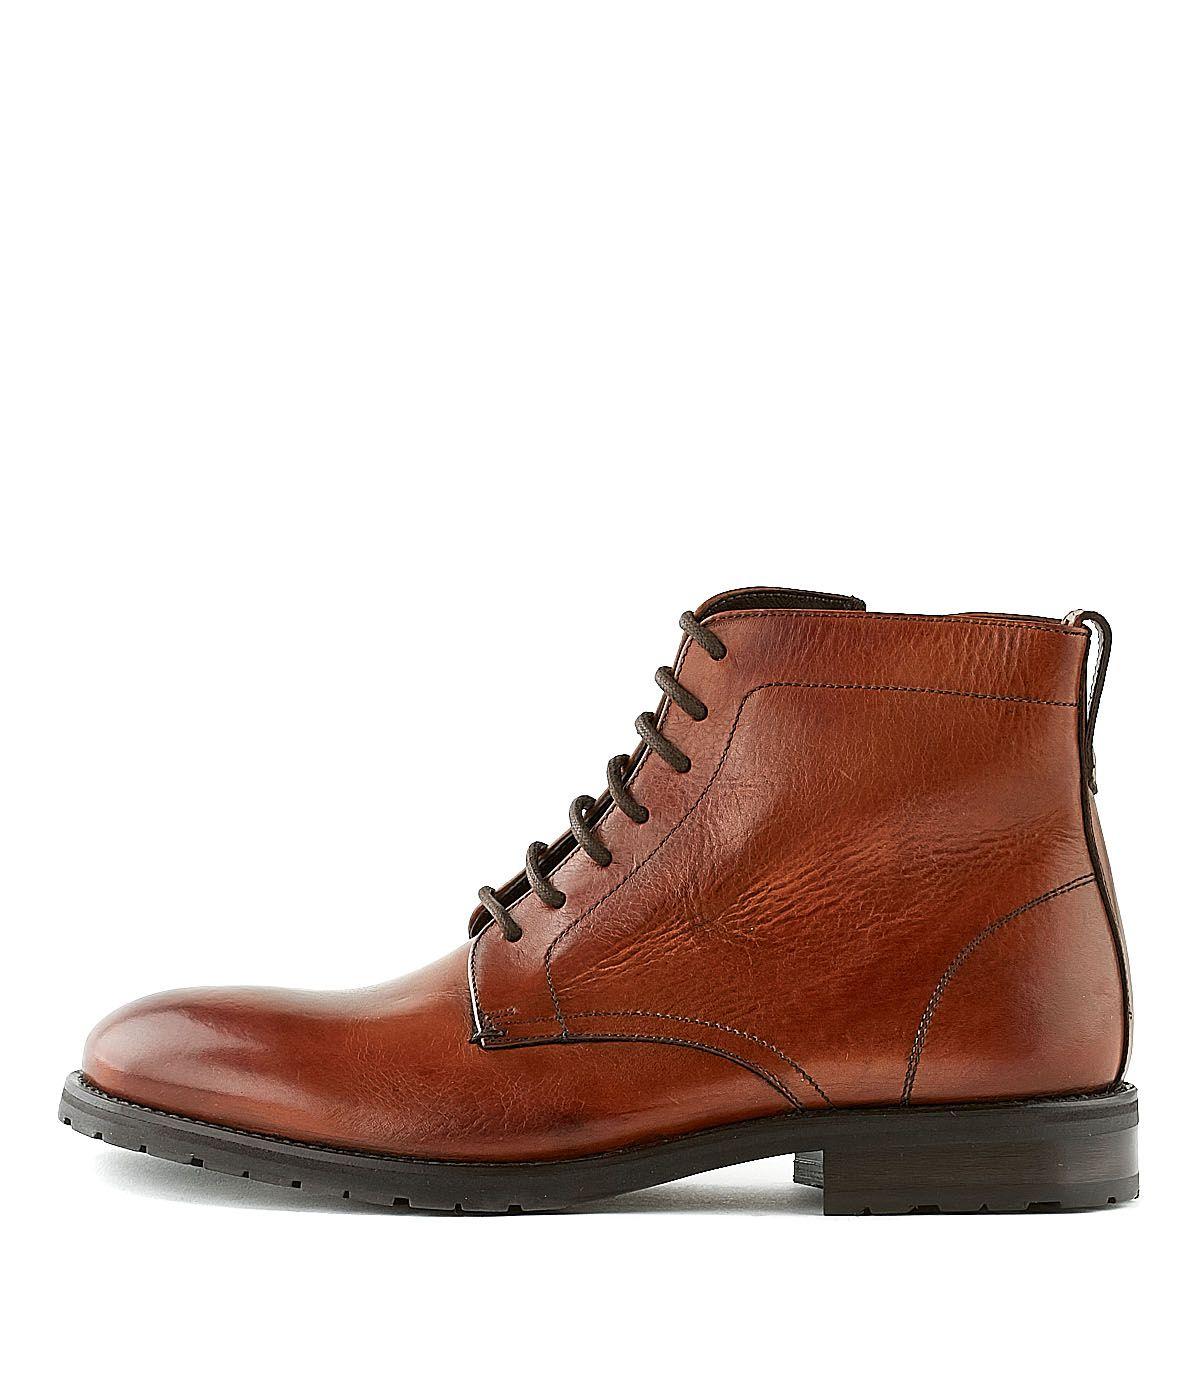 MORANDI Boot 4303 Men Cognac Rossi&Co #morandi #madeinitaly